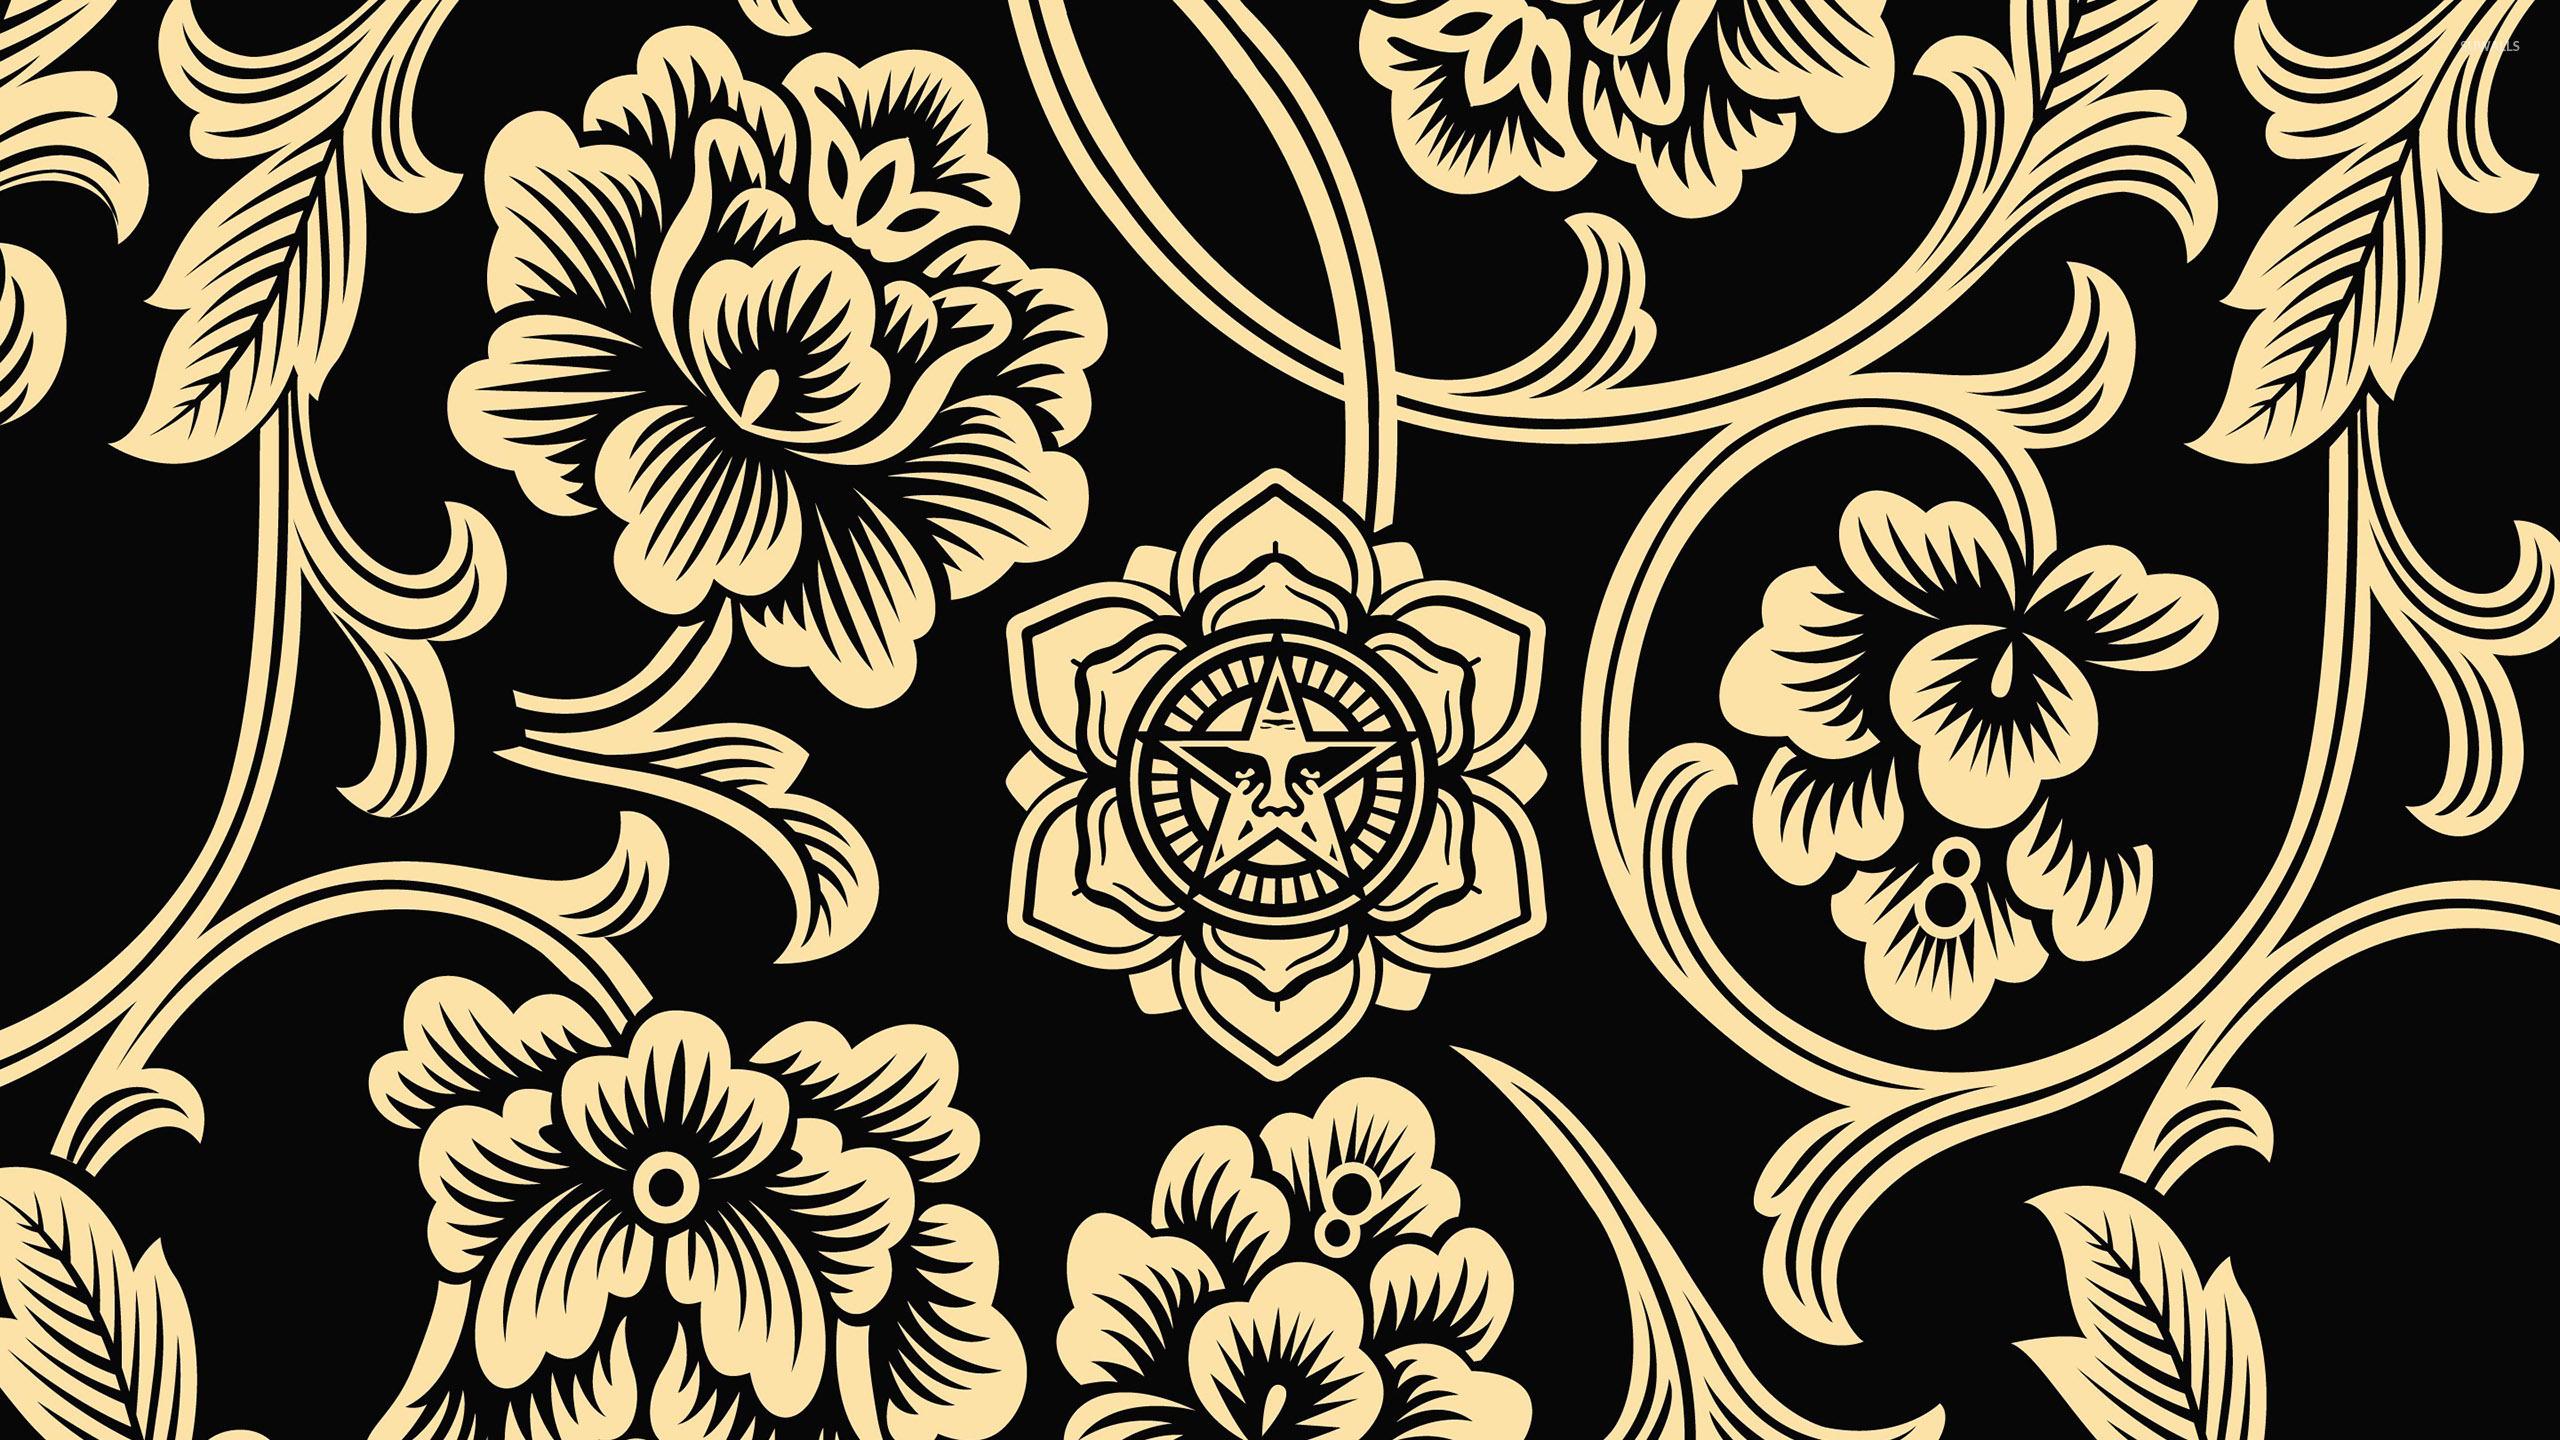 Tribal golden flowers on dark background wallpaper - Vector